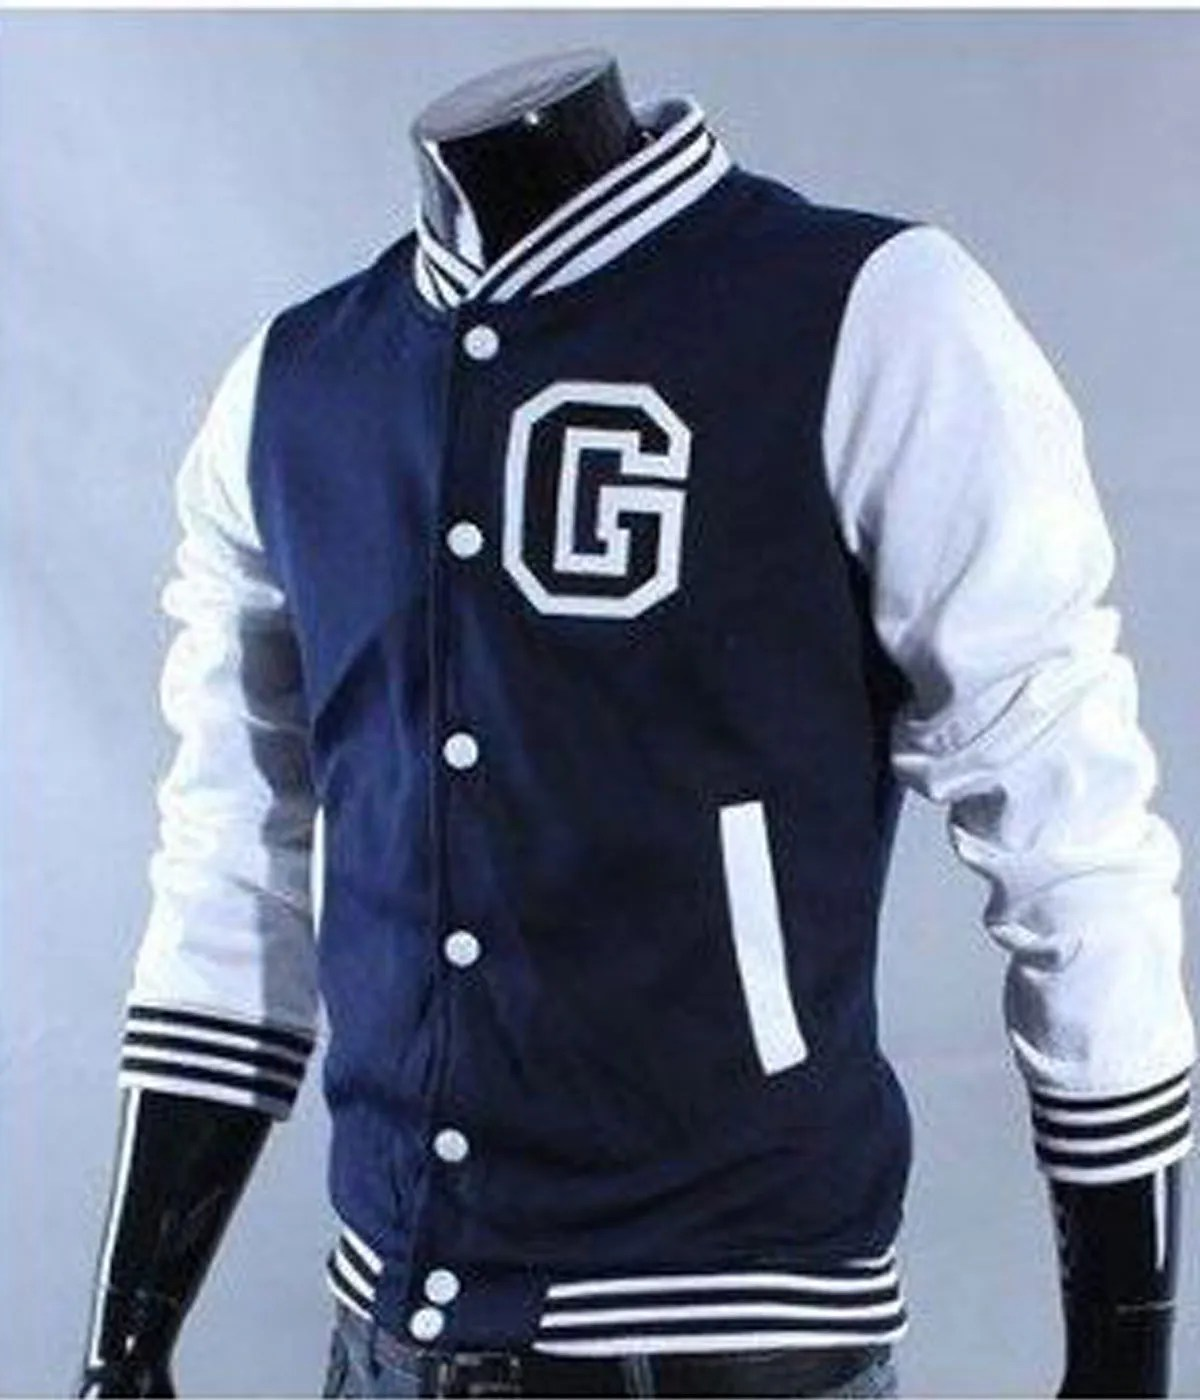 g-letterman-jacket